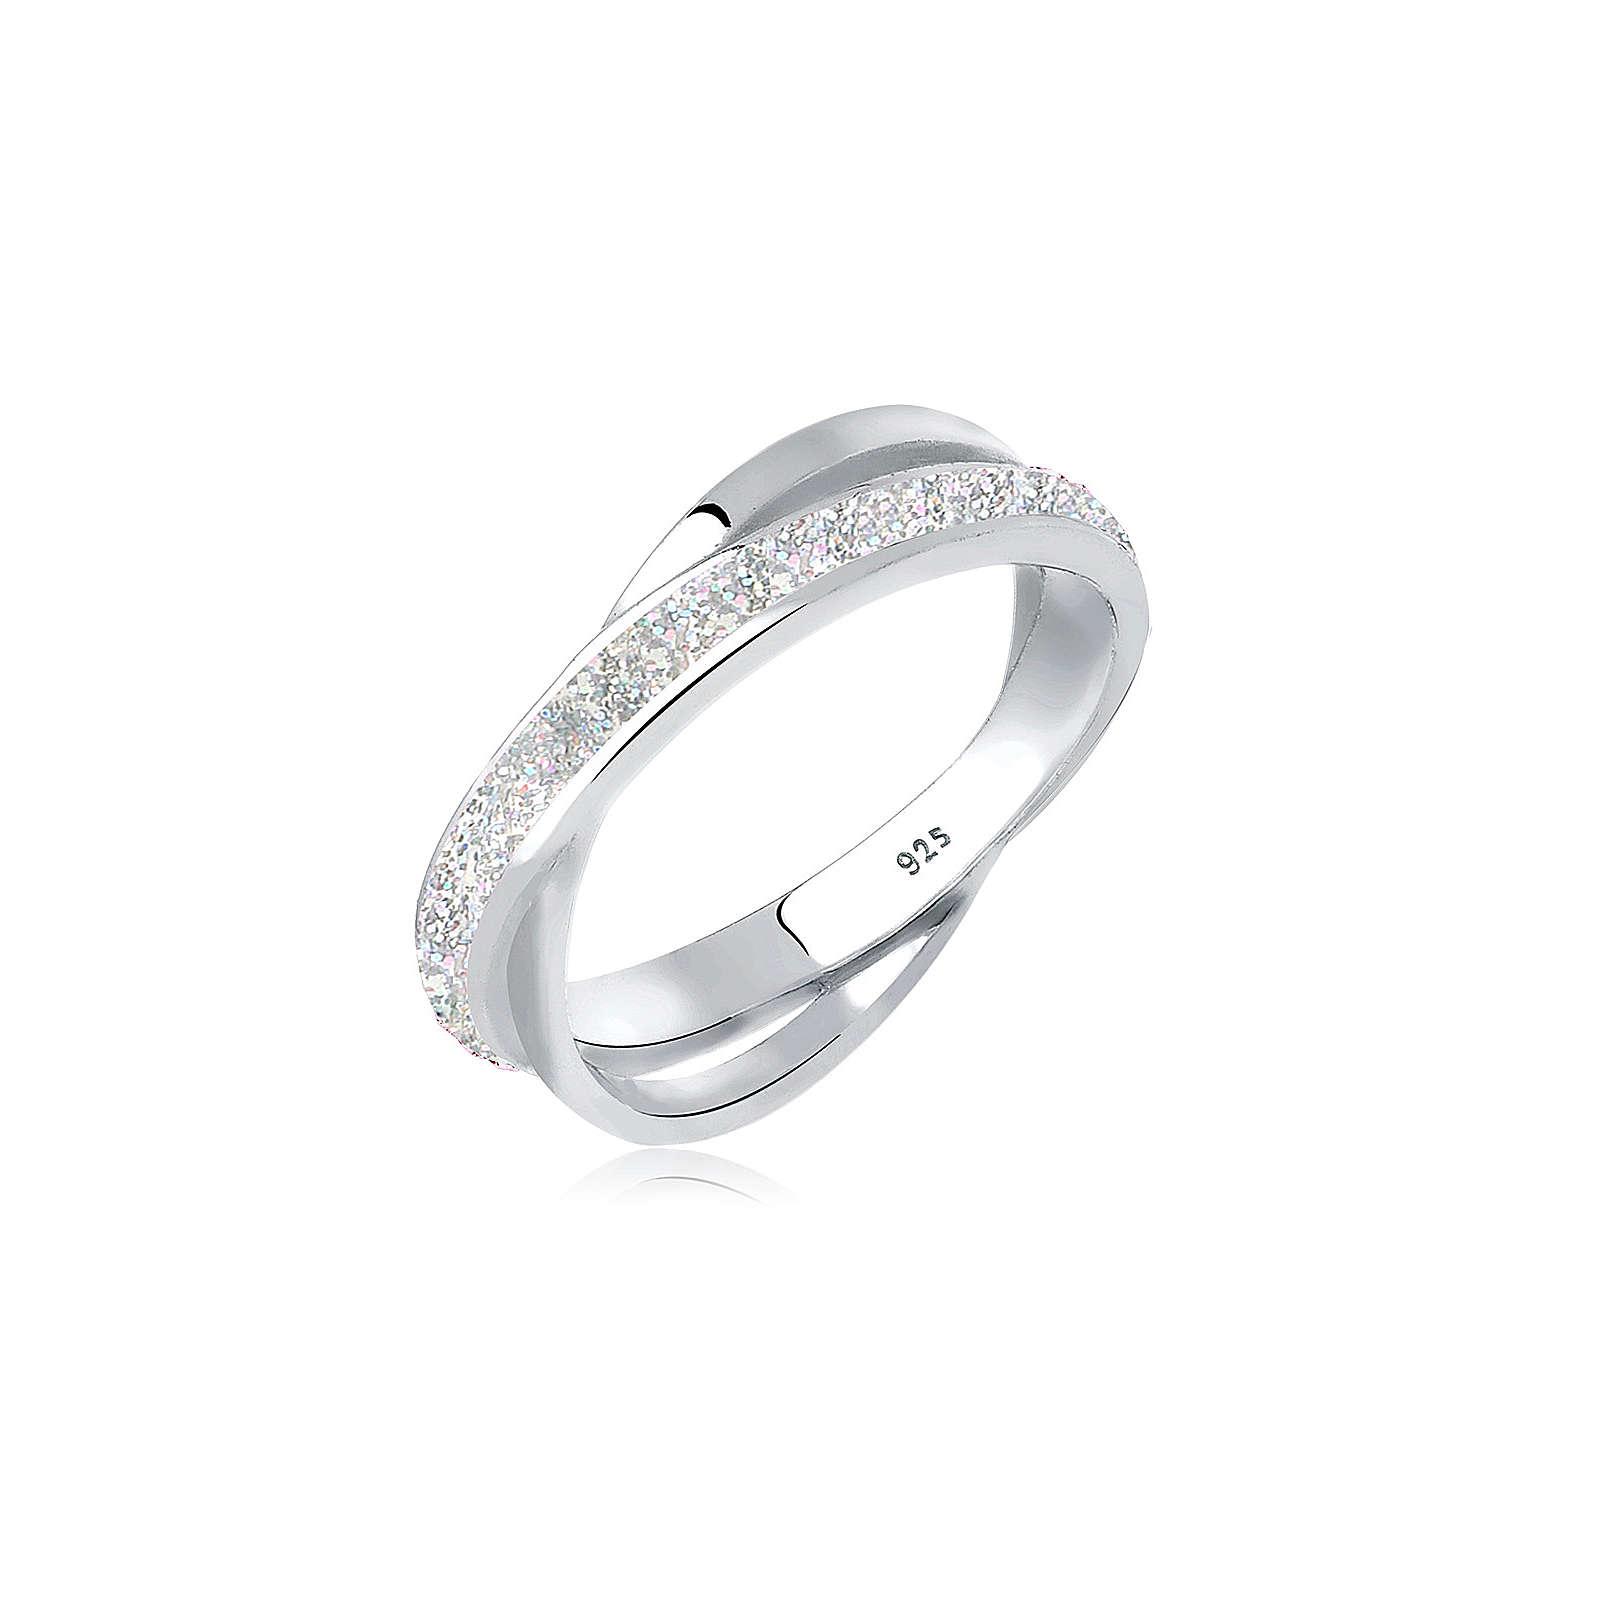 Elli Ring silber Damen Gr. 56